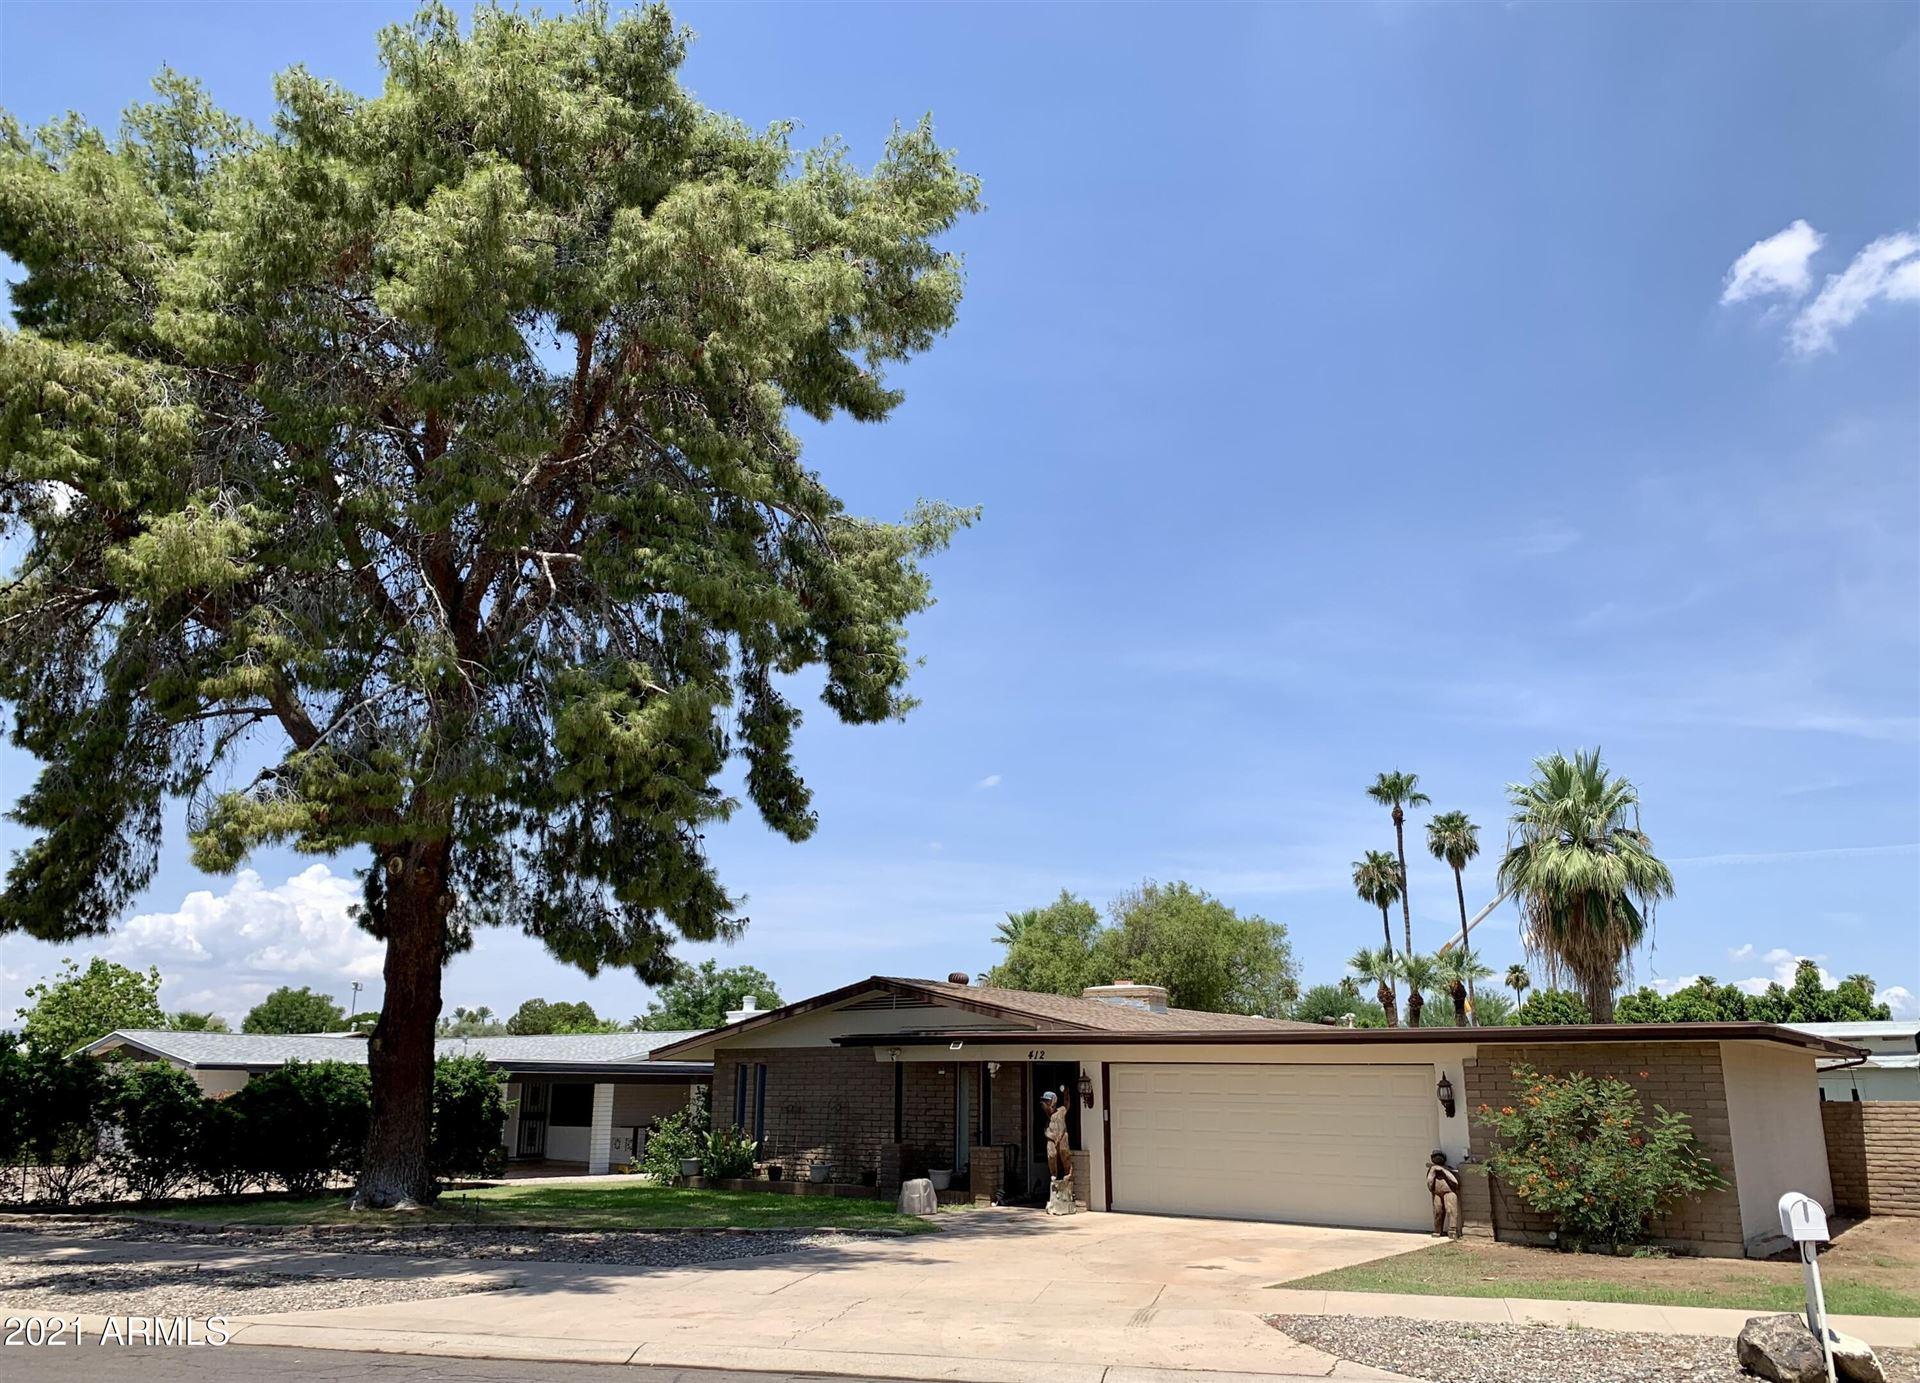 Photo of 412 E SAGEBRUSH Street, Litchfield Park, AZ 85340 (MLS # 6270482)